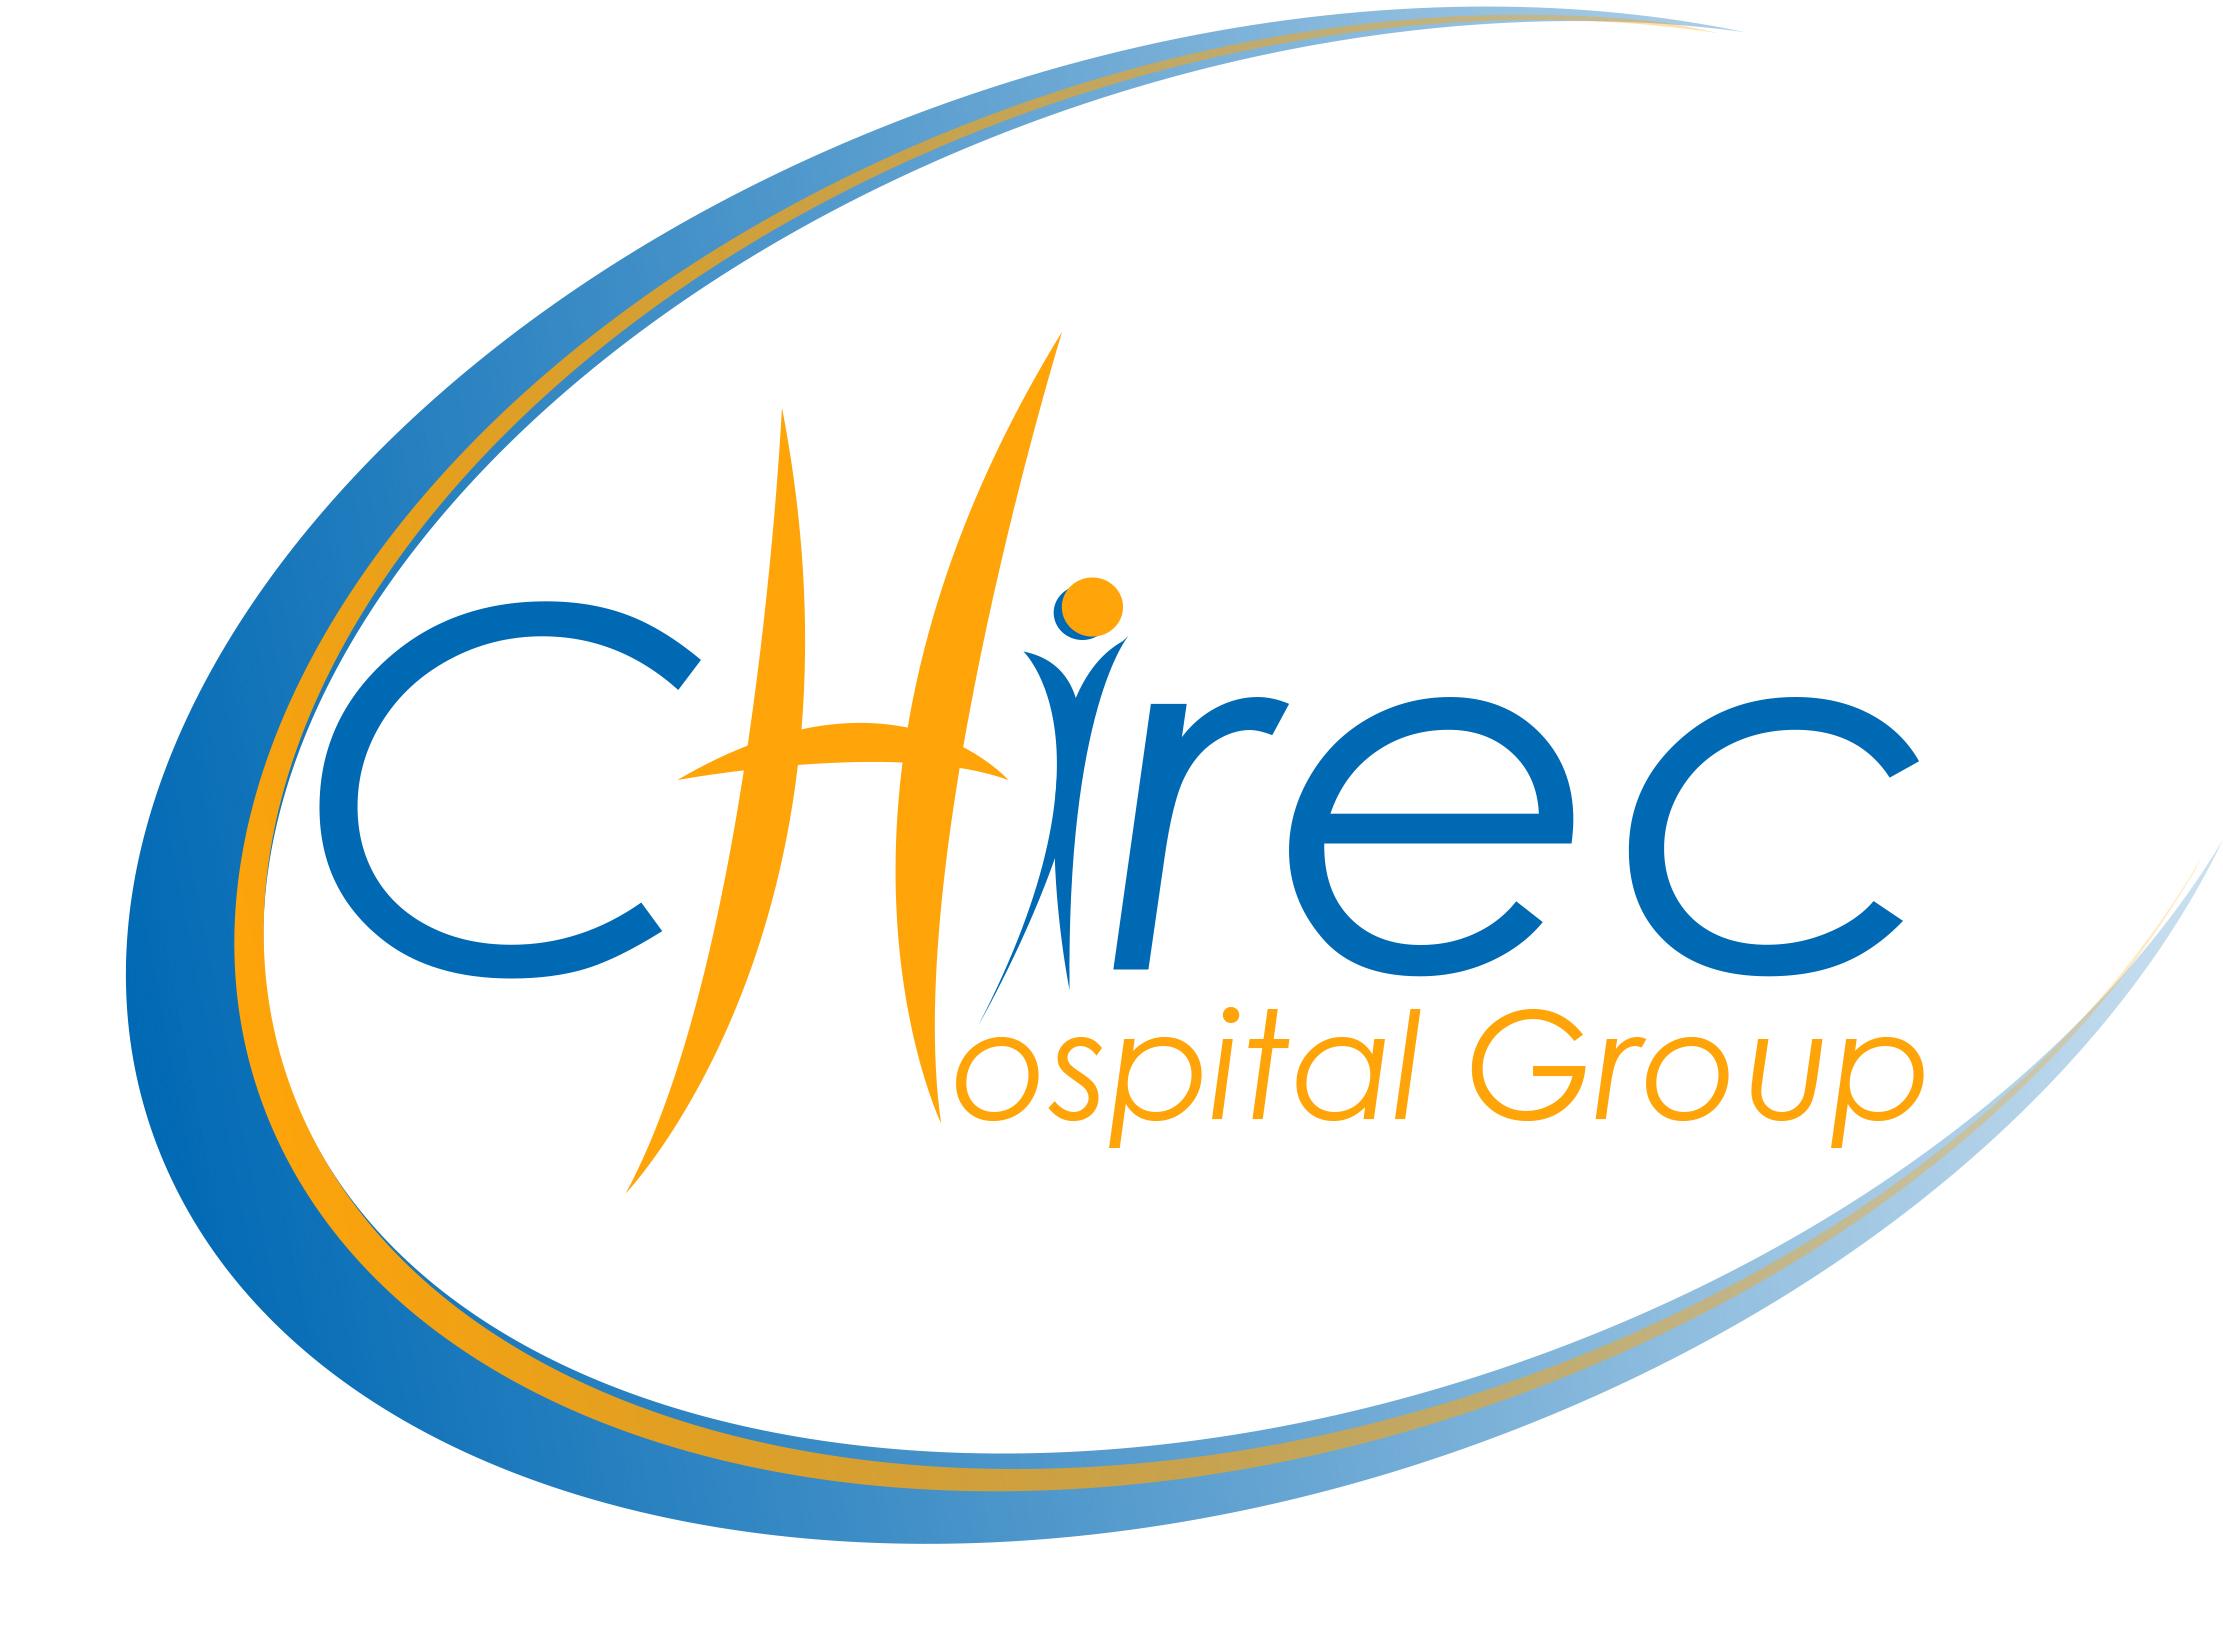 La CityClinic CHIREC Louise